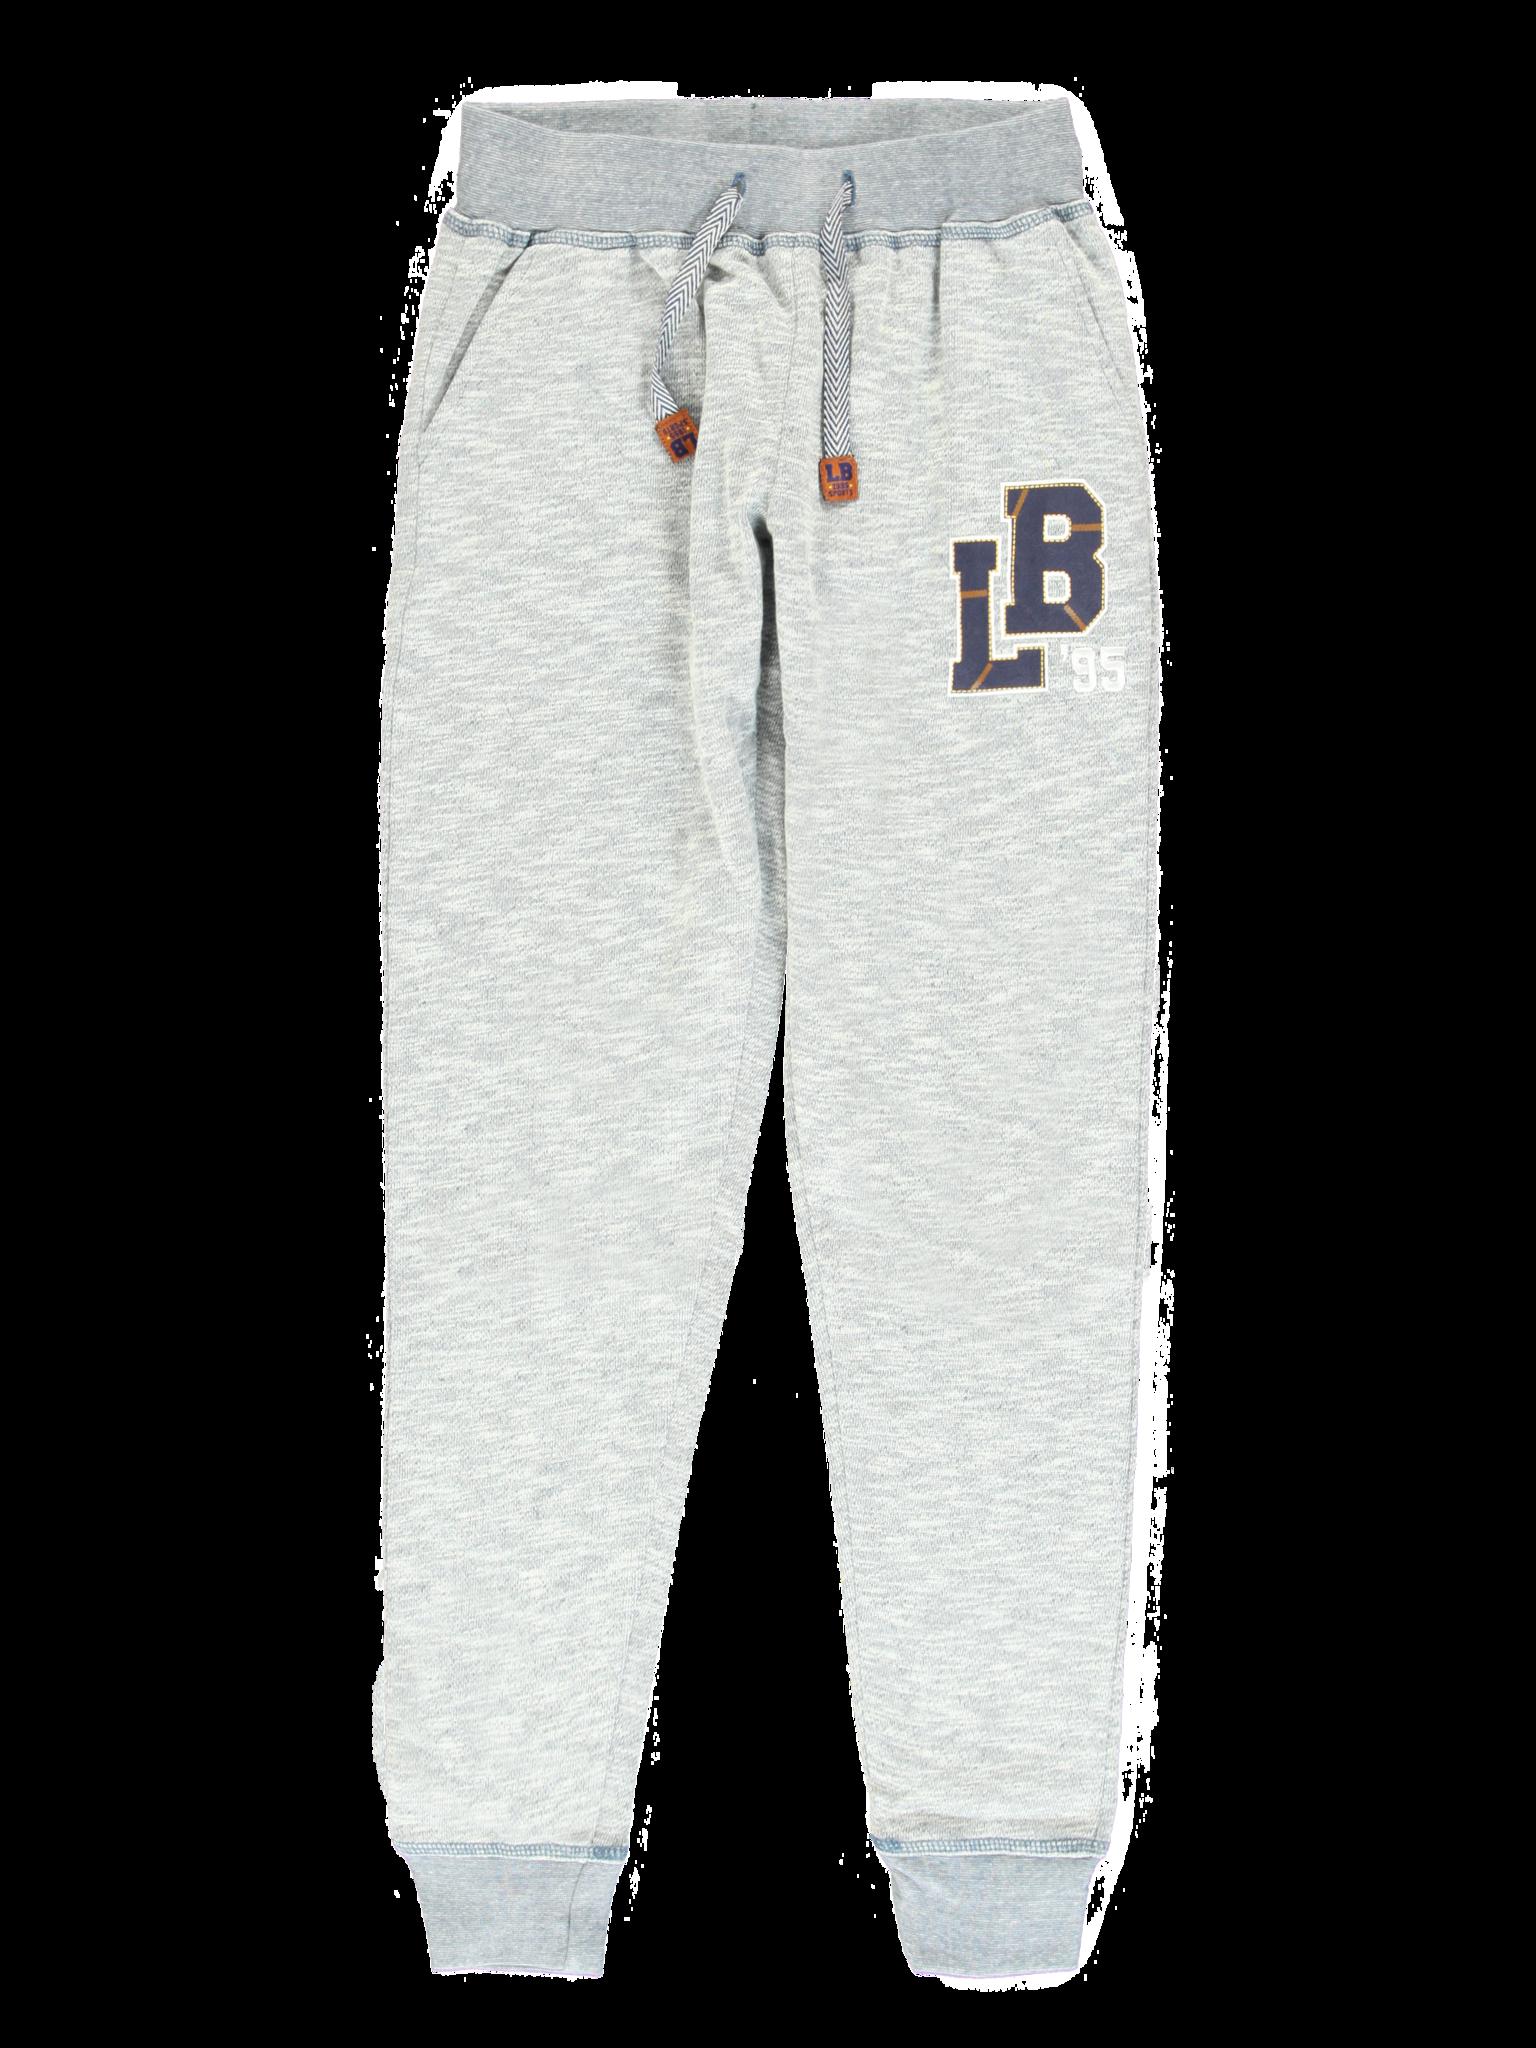 All Brands   Winterproducts Teen Boys   Jogging Pant   12 pcs/box